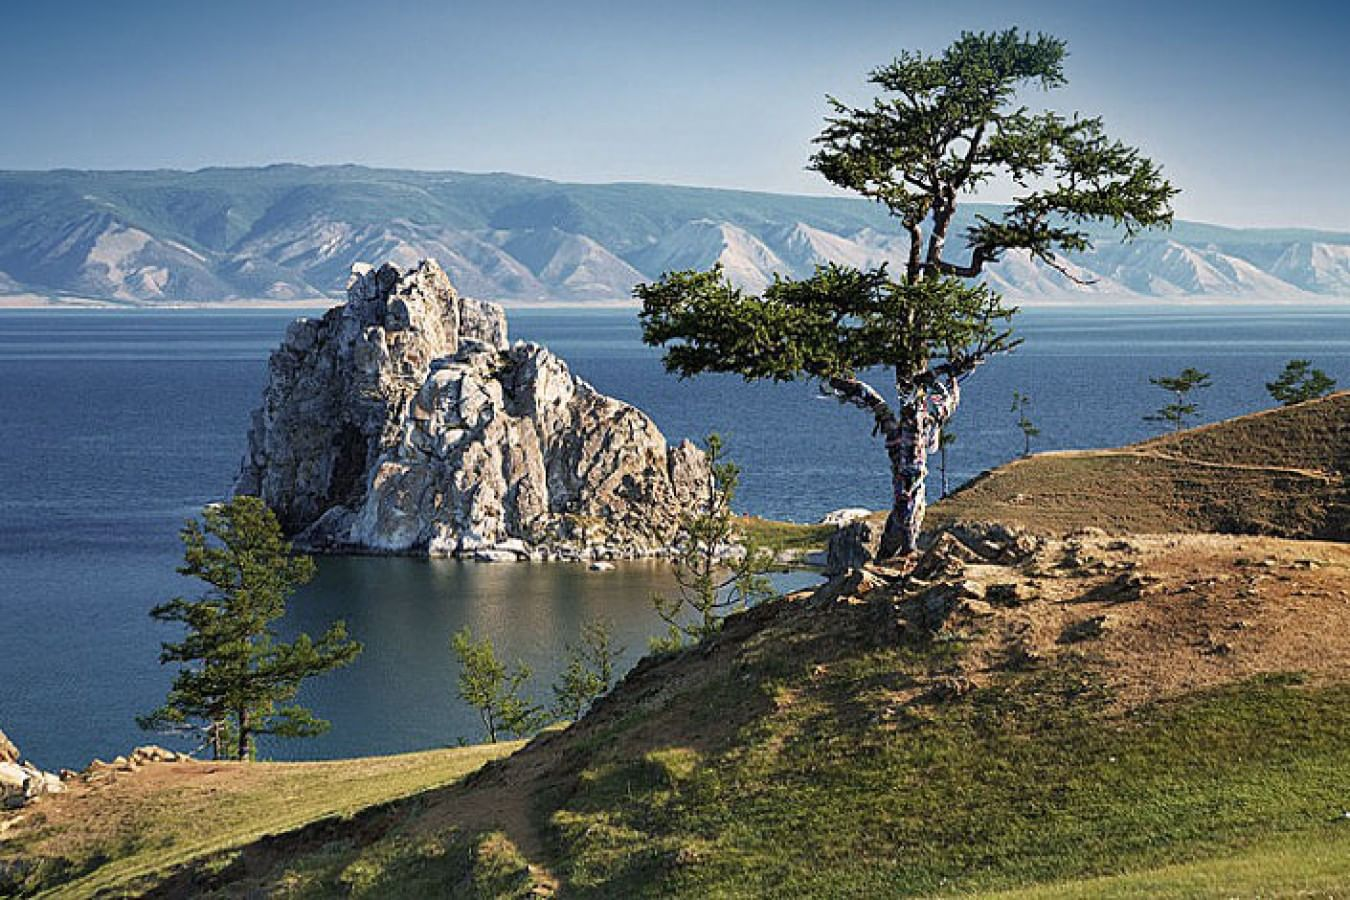 Озеро Байкал, Танганьи́ка